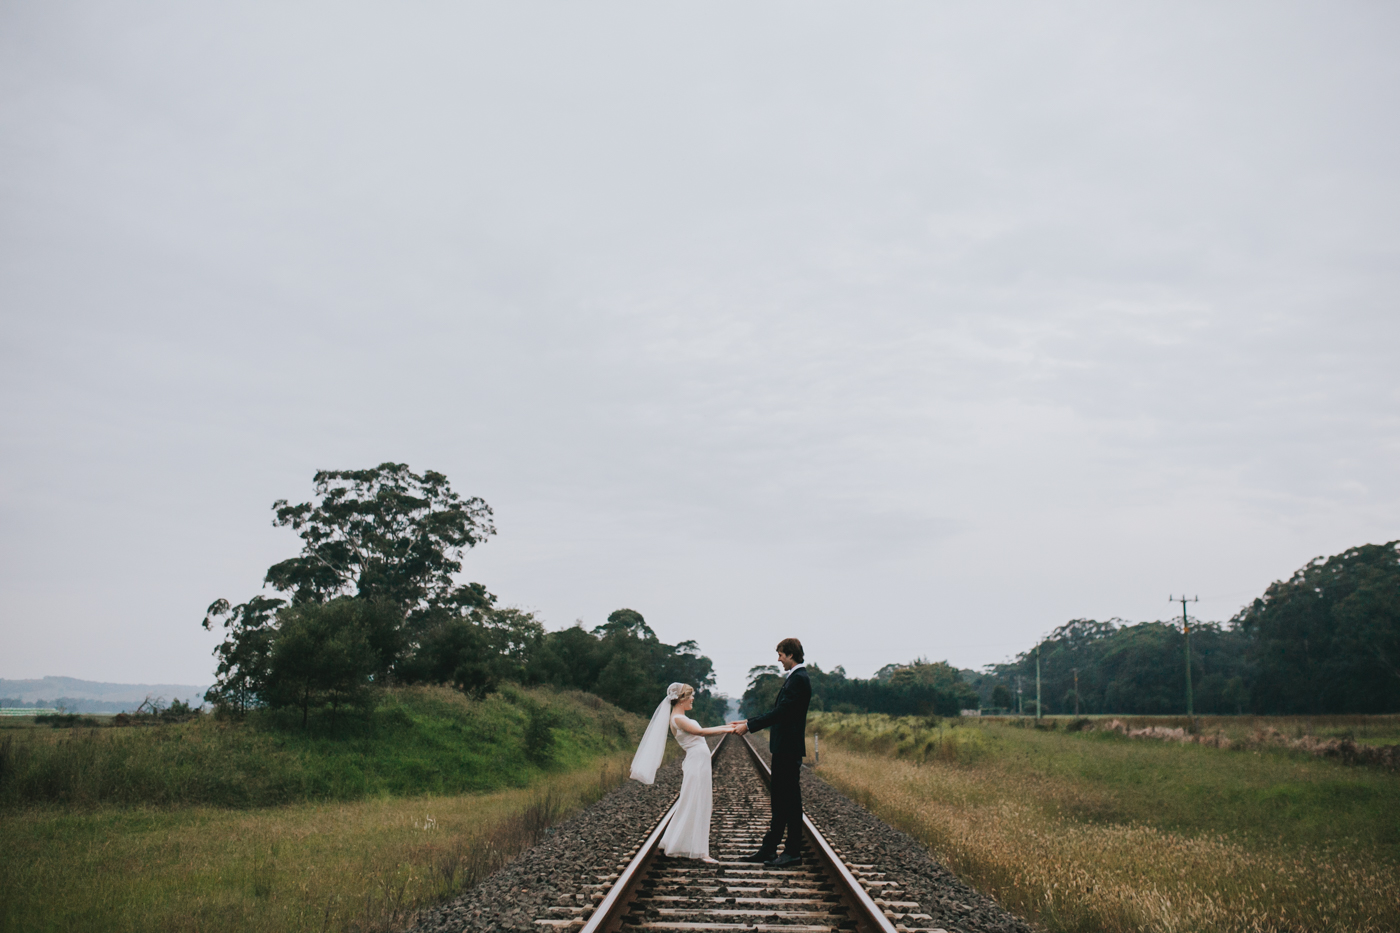 Rachel & Jacob - Willow Farm Berry - South Coast Wedding - Samantha Heather Photography-167.jpg